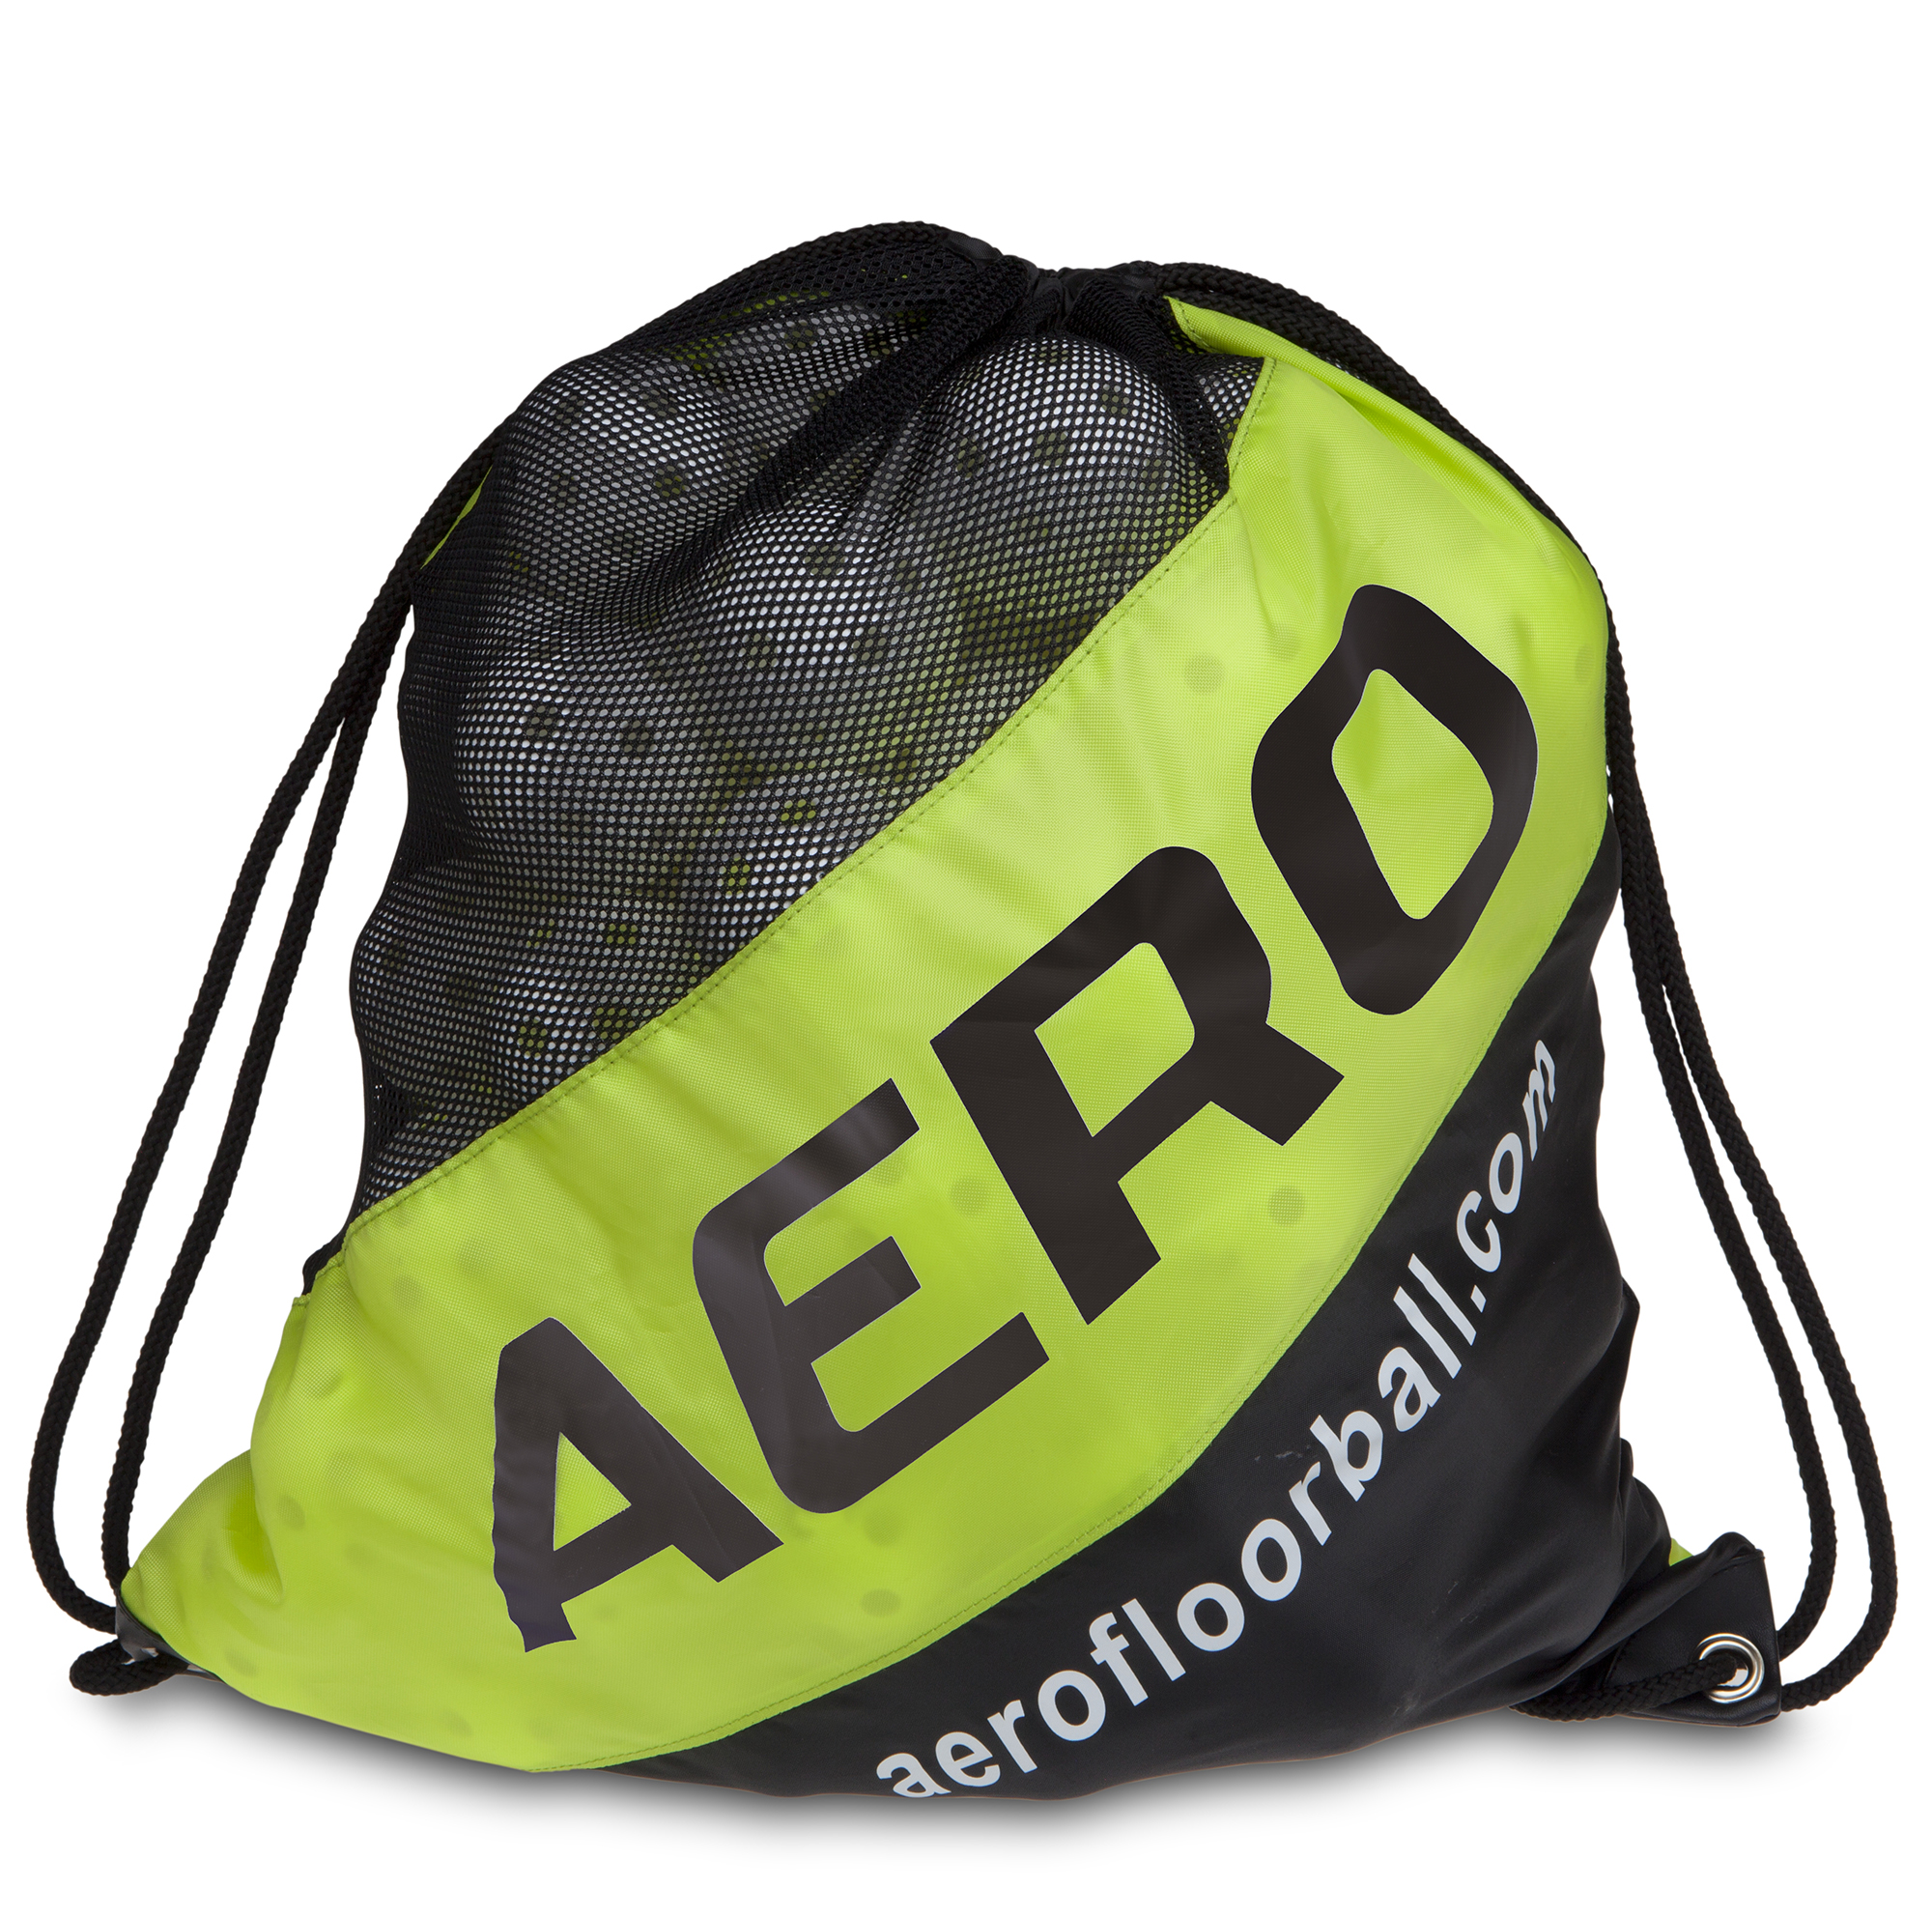 Image of   Salming Aero Ball Sack 80 stk - Sort / Fluo Gul